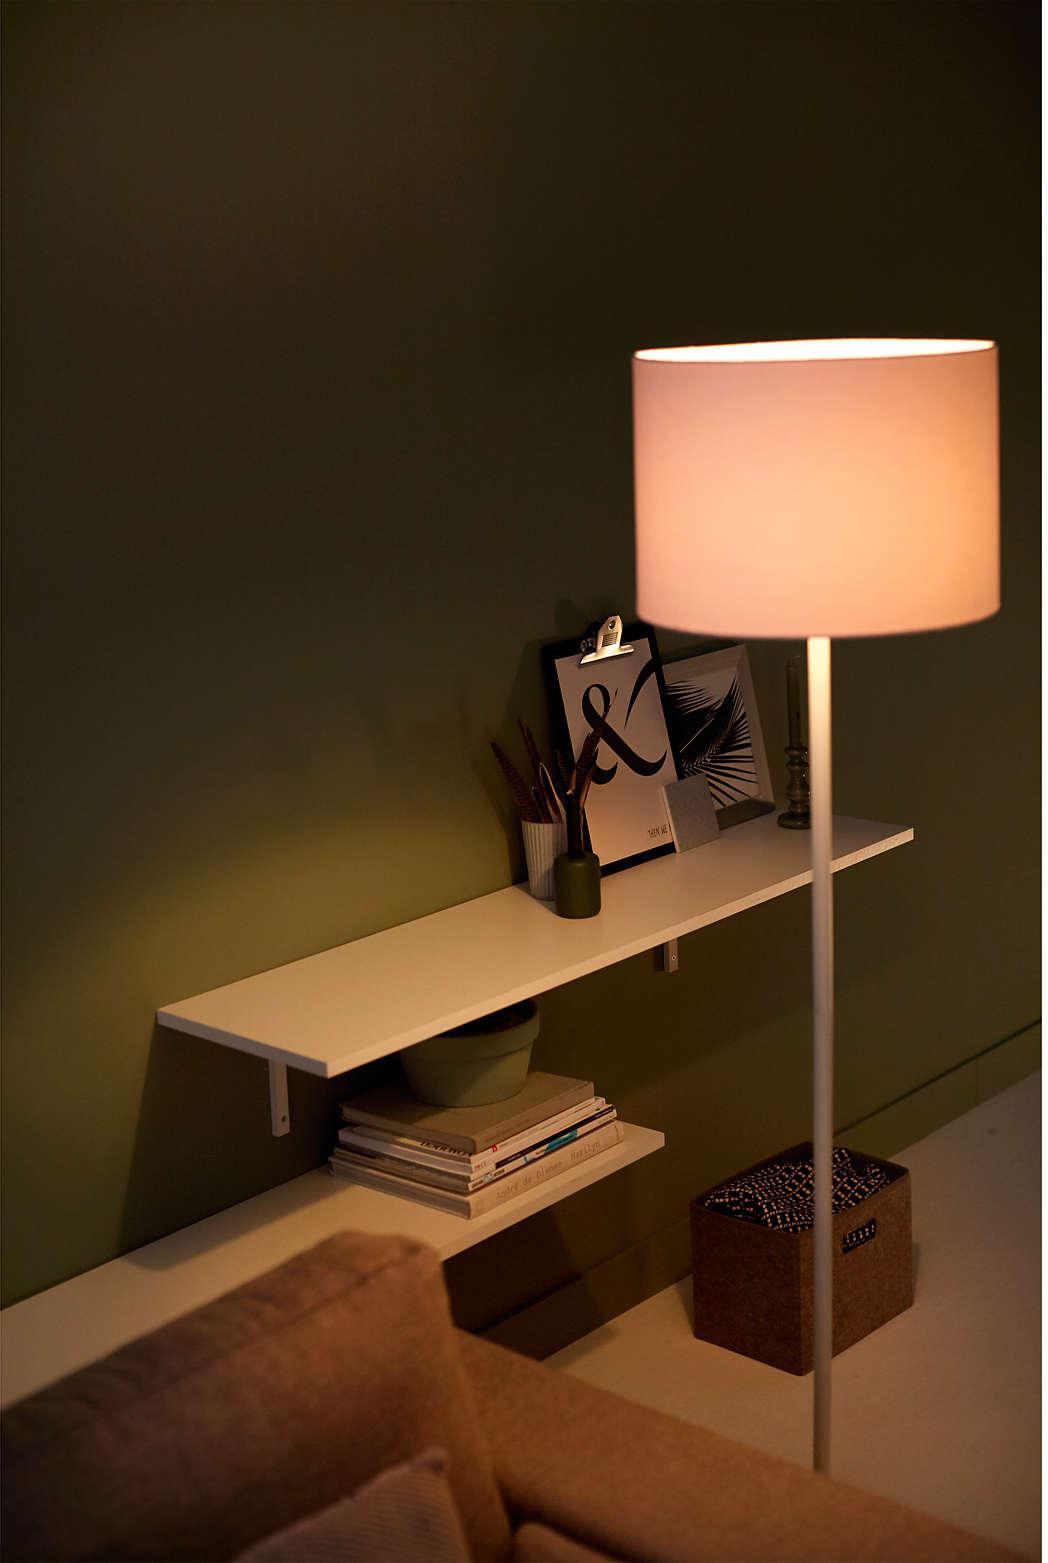 Philips LED limba lampa stojacie 5W 36018/38/E7